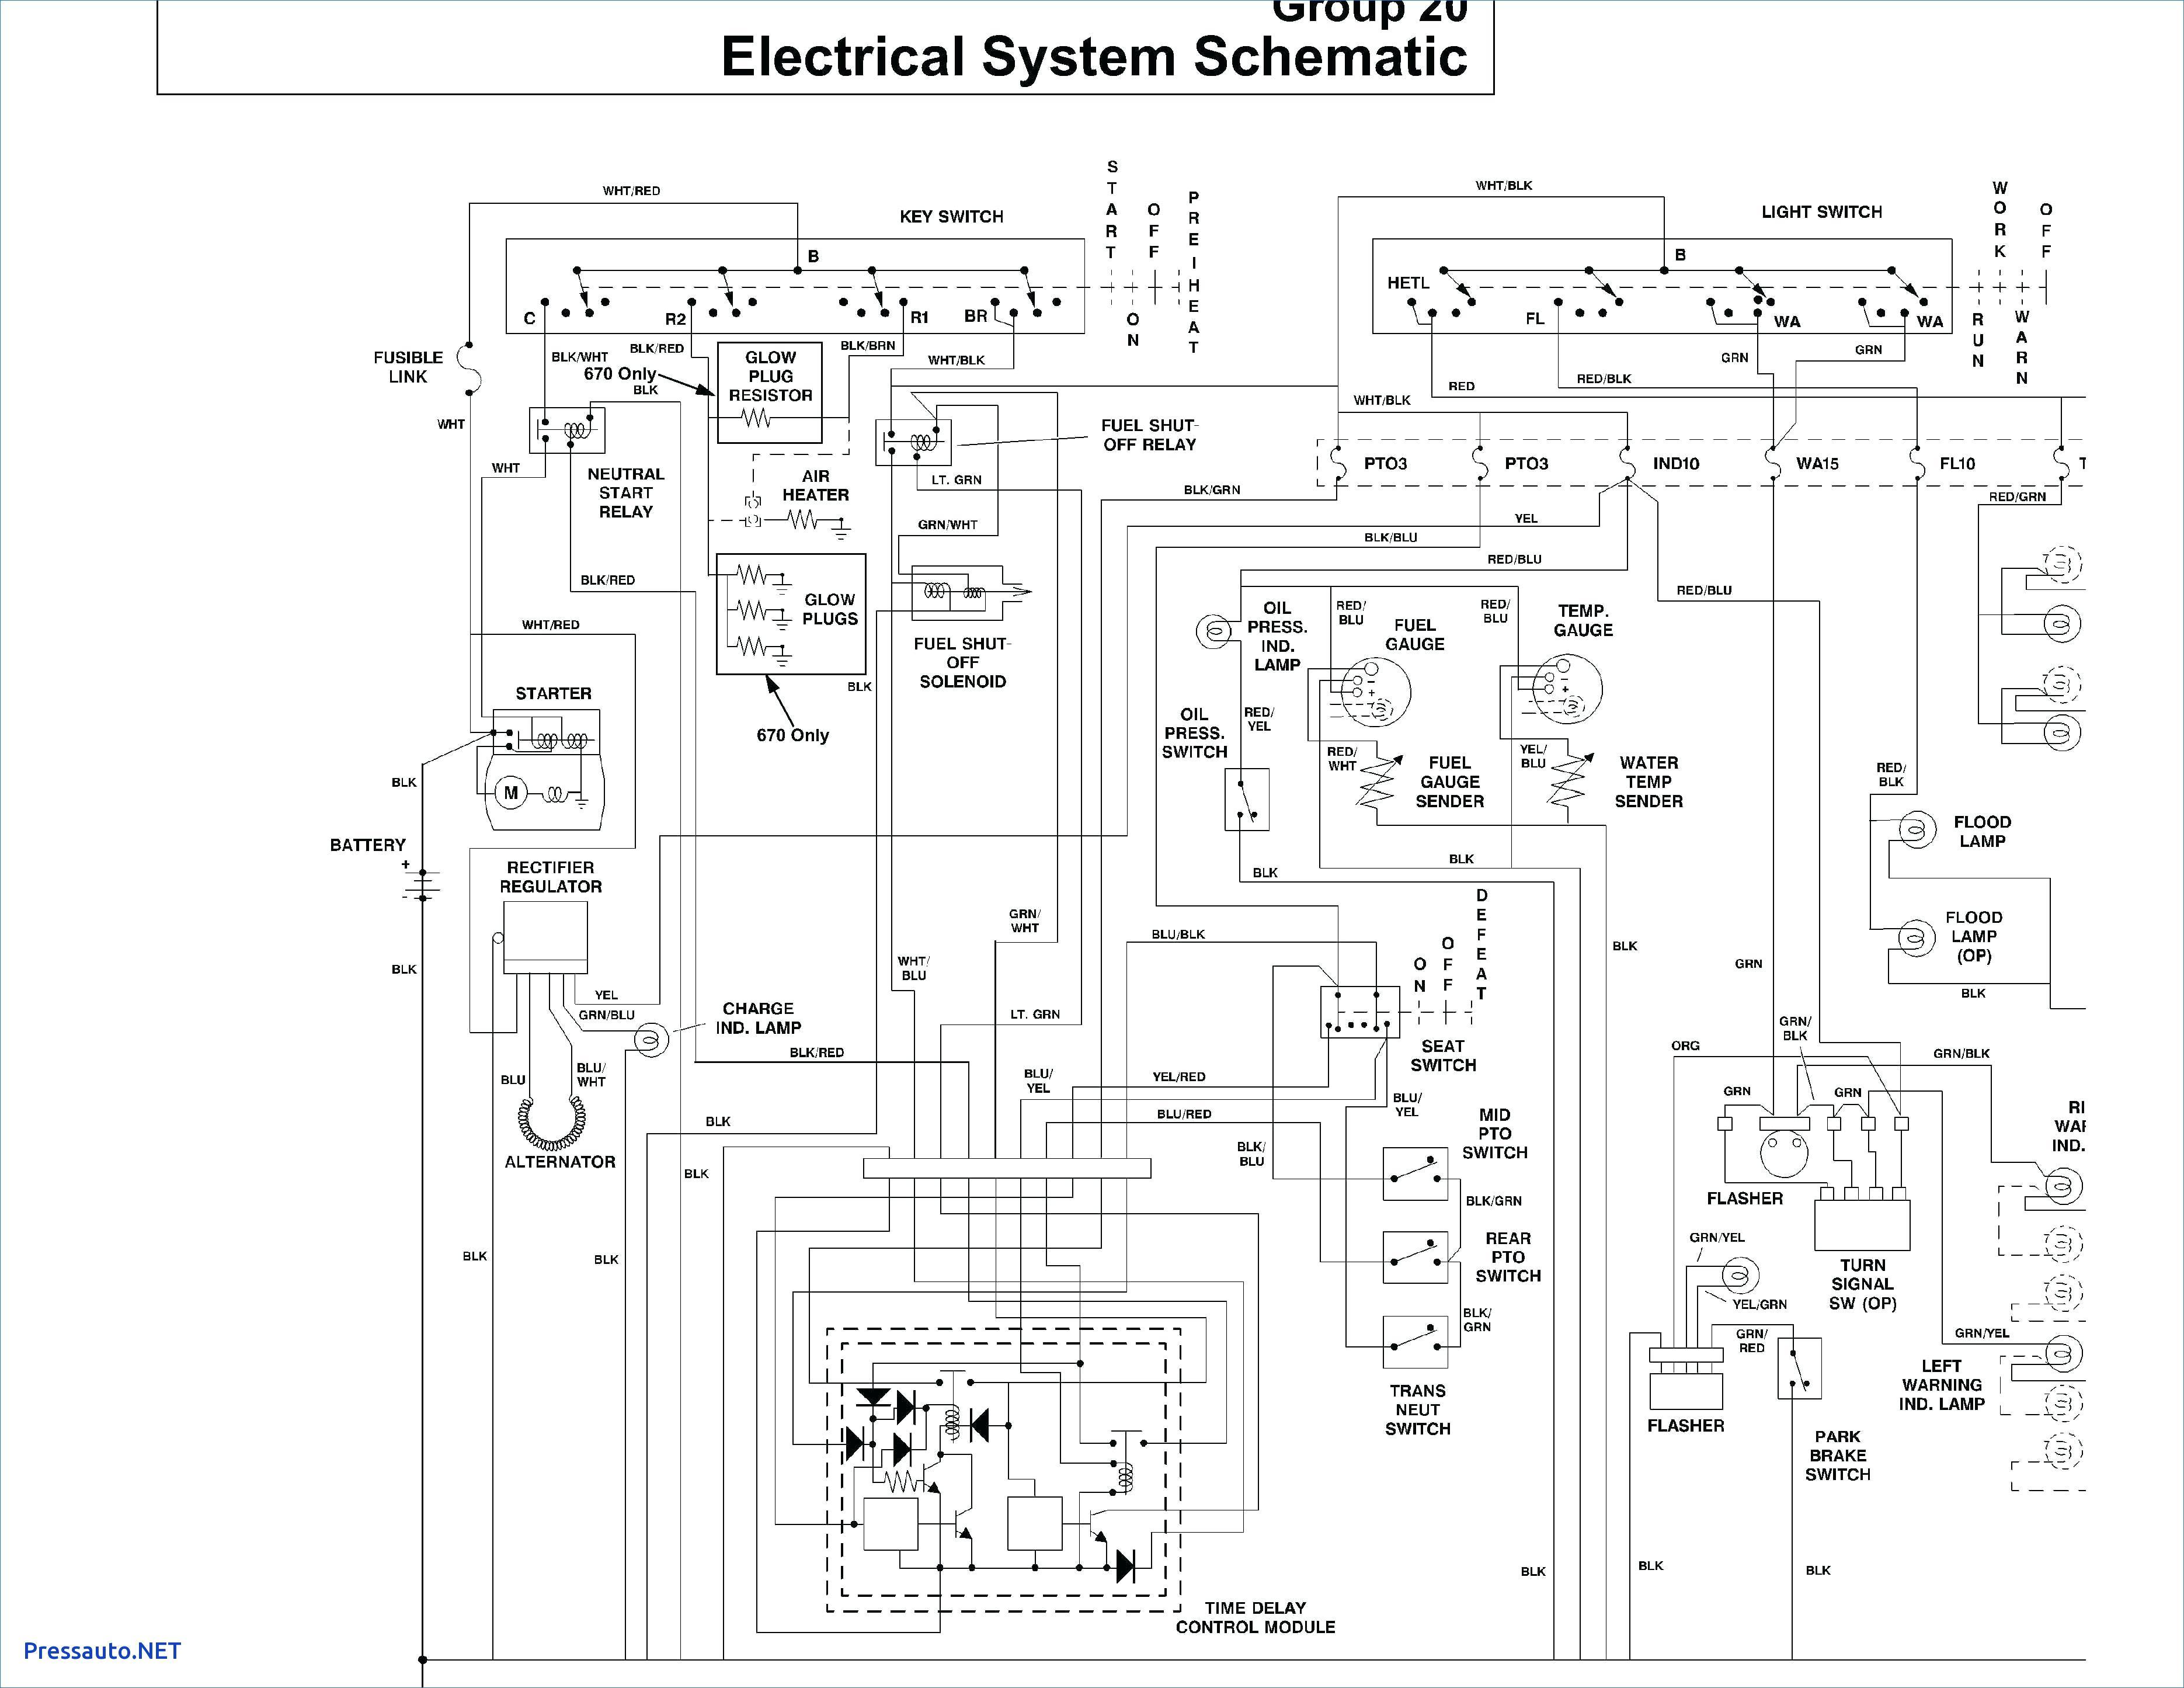 1938 Ford 8N Wiring Diagram | Wiring Library - Ford 8N 12 Volt Conversion Wiring Diagram